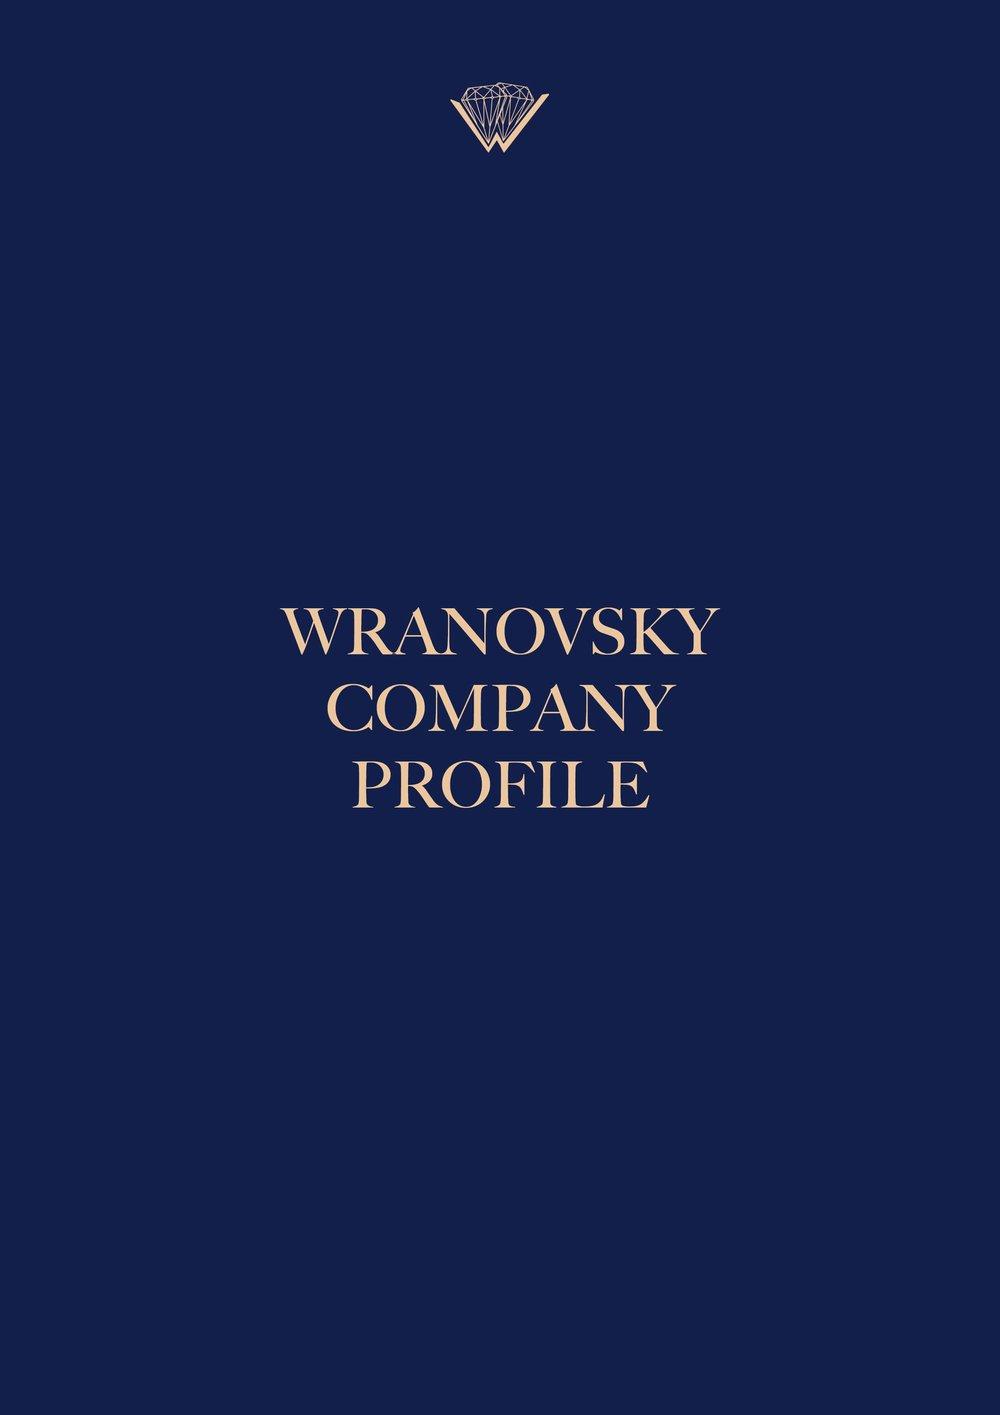 wranovsky-company-profile.jpg